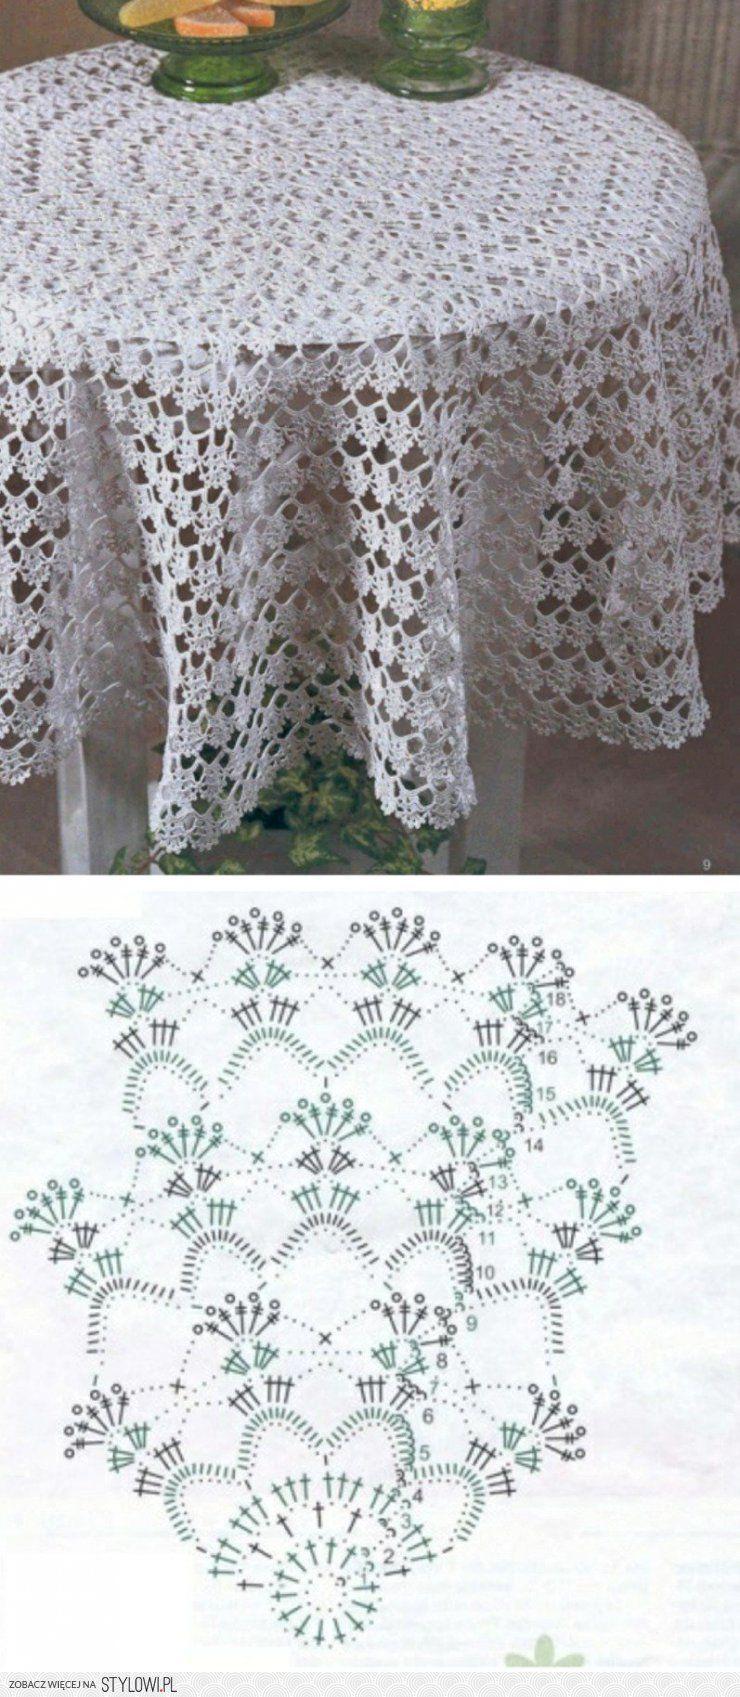 Manteles crochet   Mantel   Pinterest   Mantel, Ganchillo y Tejido